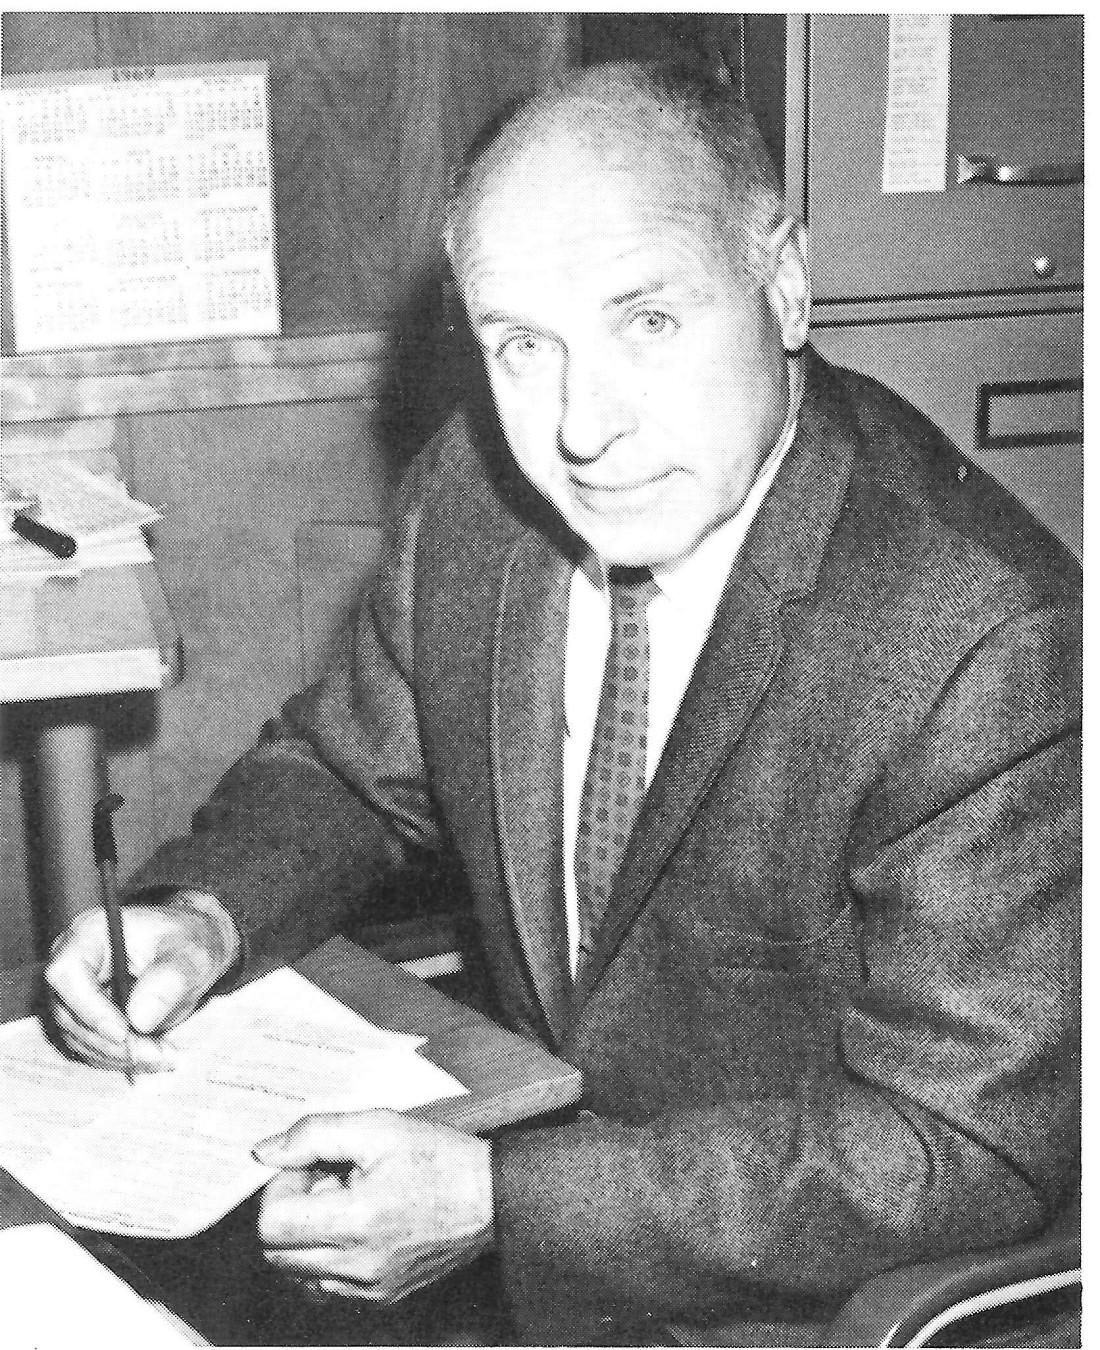 #949 Mr. Pat Pettichord, Principal BGHS